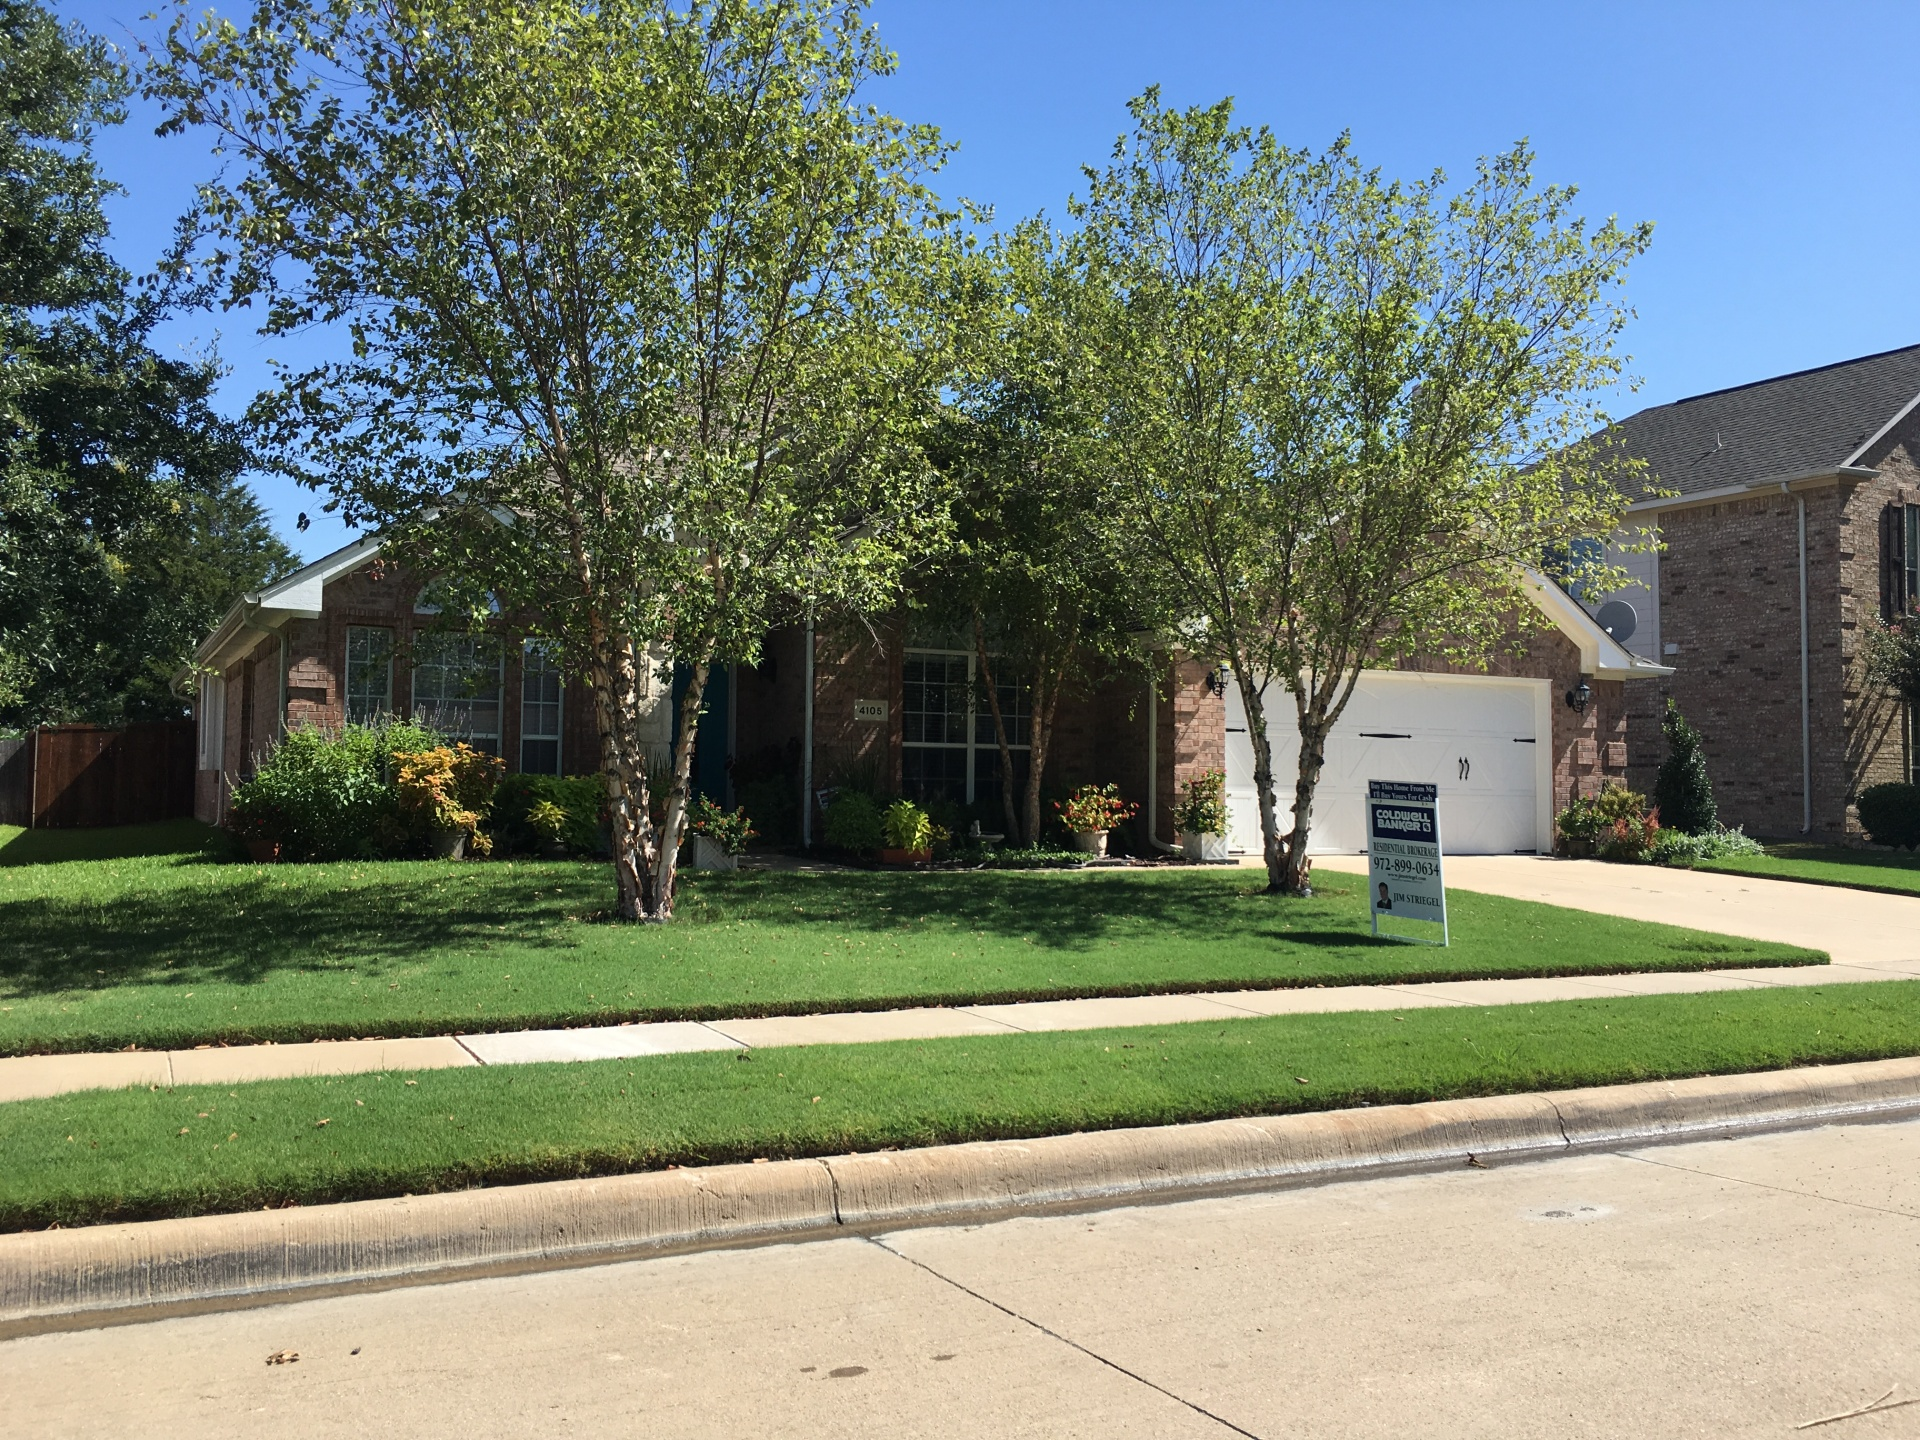 Mathews Lawn Care Arlington, Texas